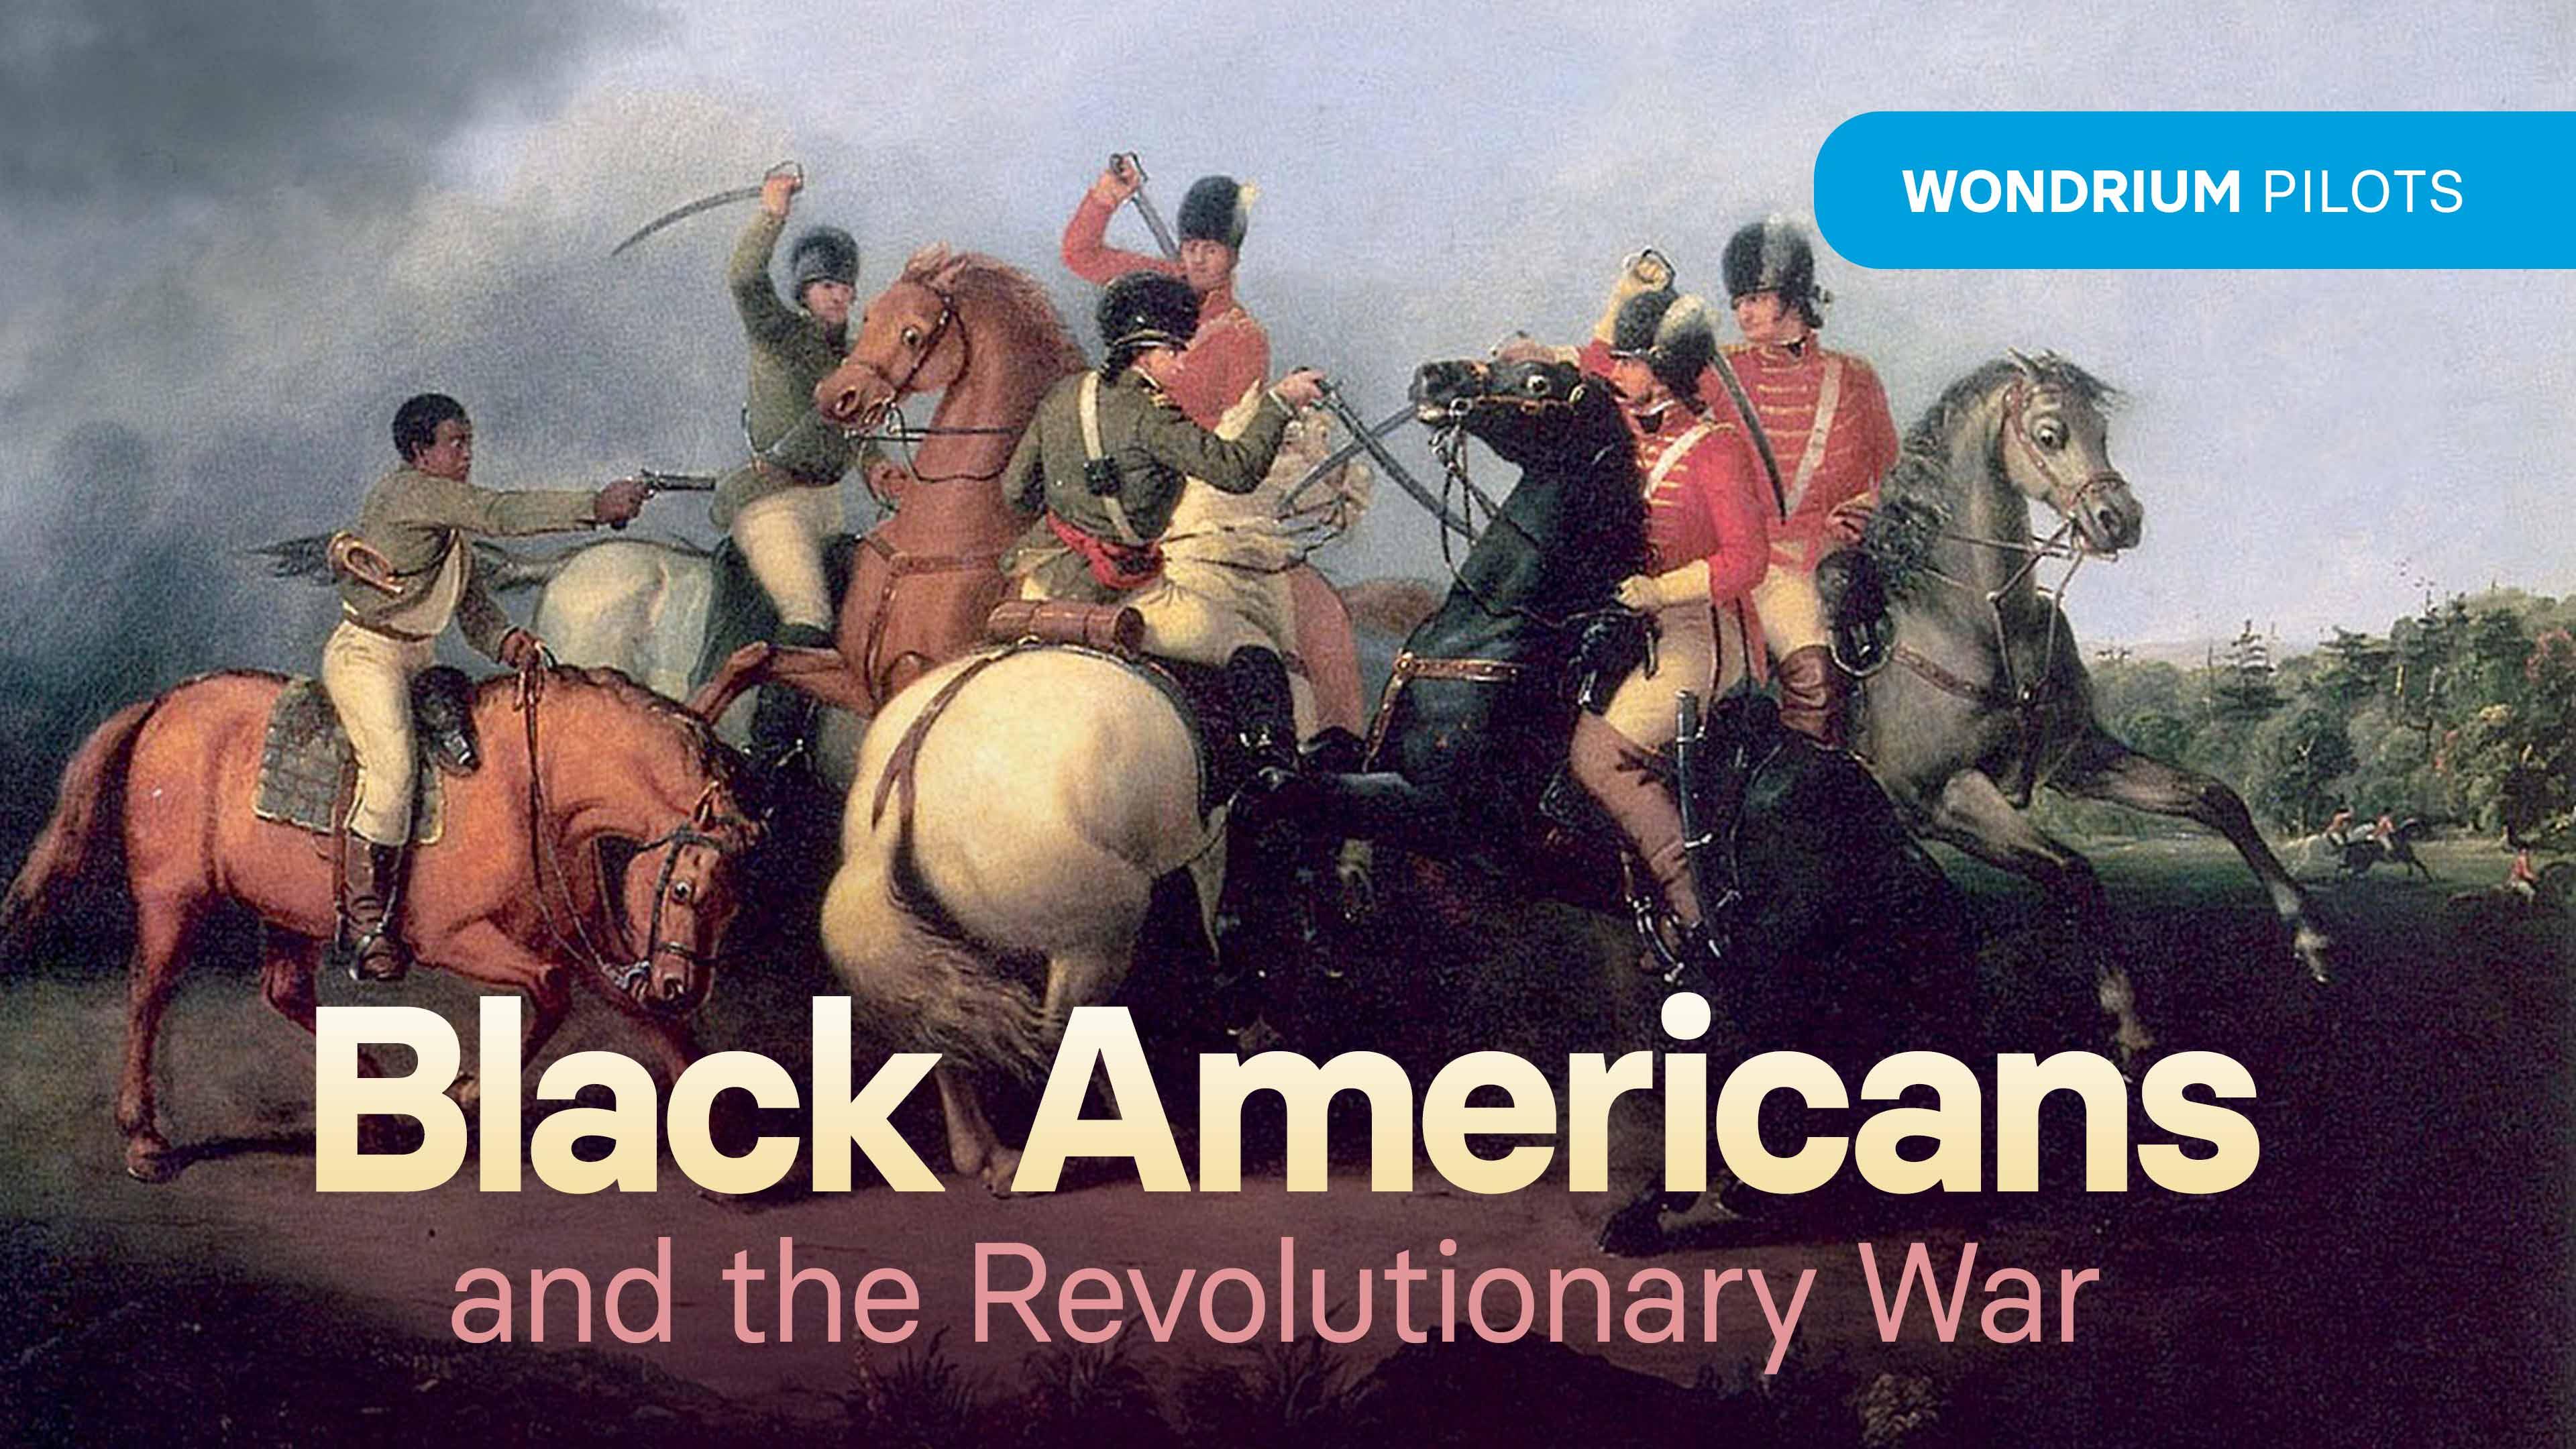 Wondrium Pilots: Black Americans and the Revolutionary War